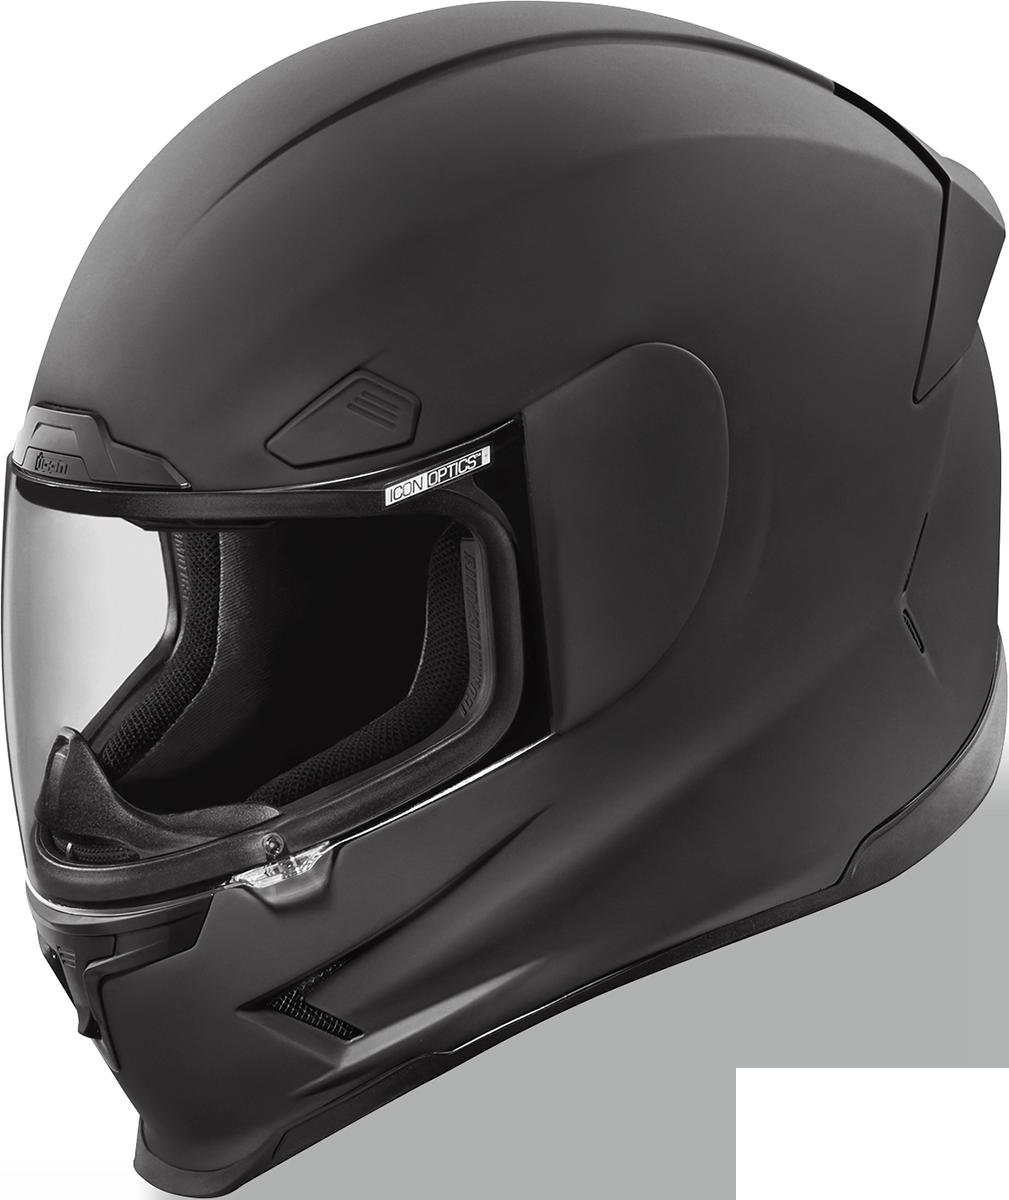 Icon Black Airframe Pro Rubatone Full Face Motorcycle Street Racing Helmet DOT